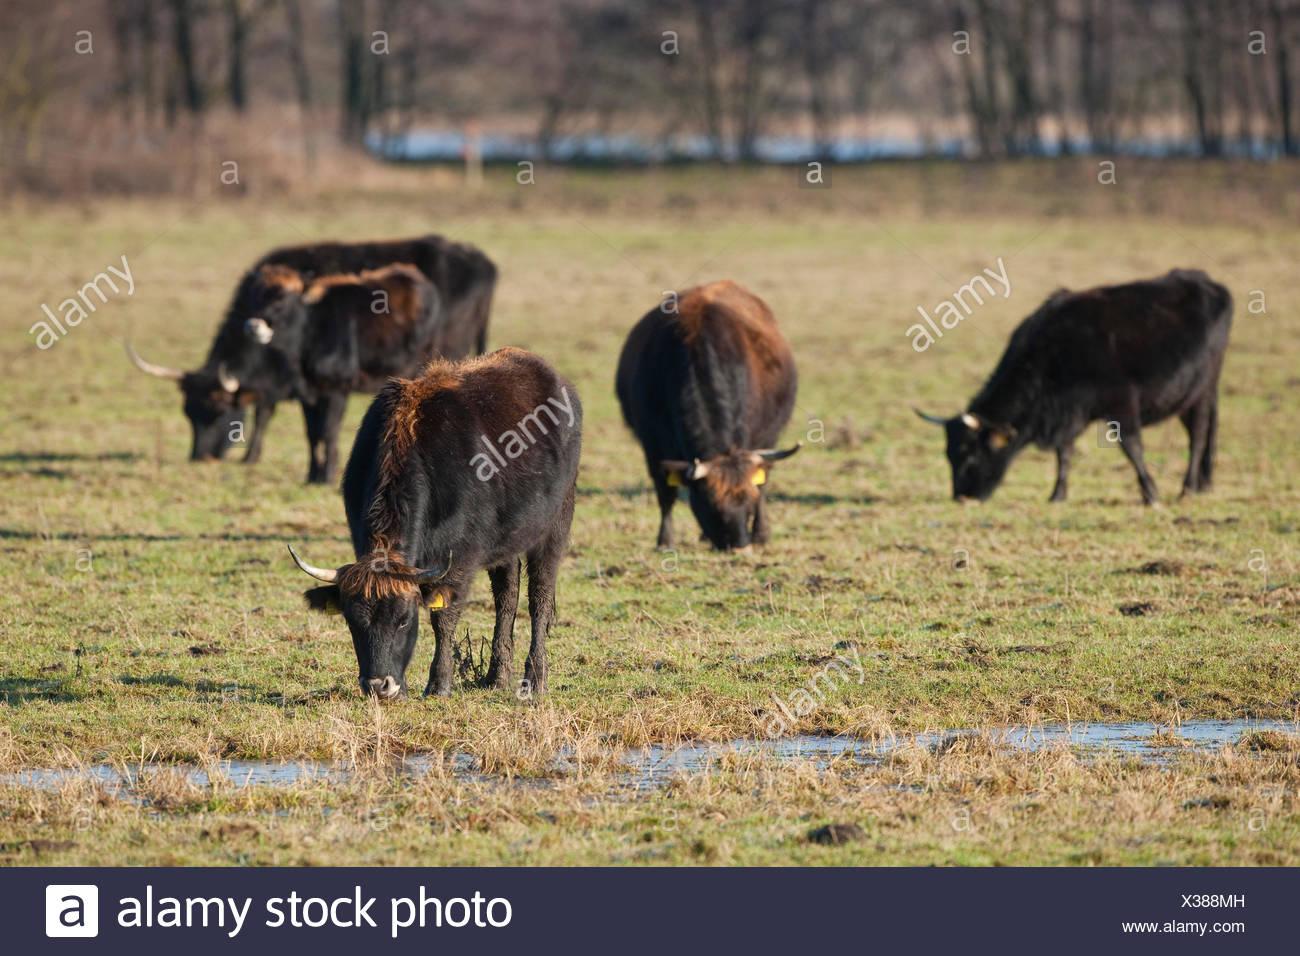 Heck cattle, breed back of extinct aurochs (Bos primigenius), herd, Volkswagen grazing project at NSG Ilkerbruch near Wolfsburg - Stock Image